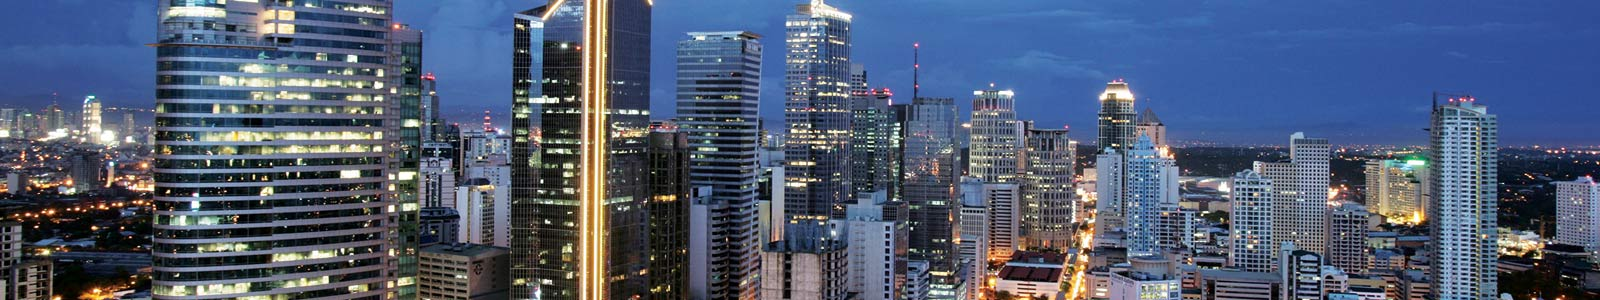 5 Best Rooftop Bars in Manila [2019 UPDATE]